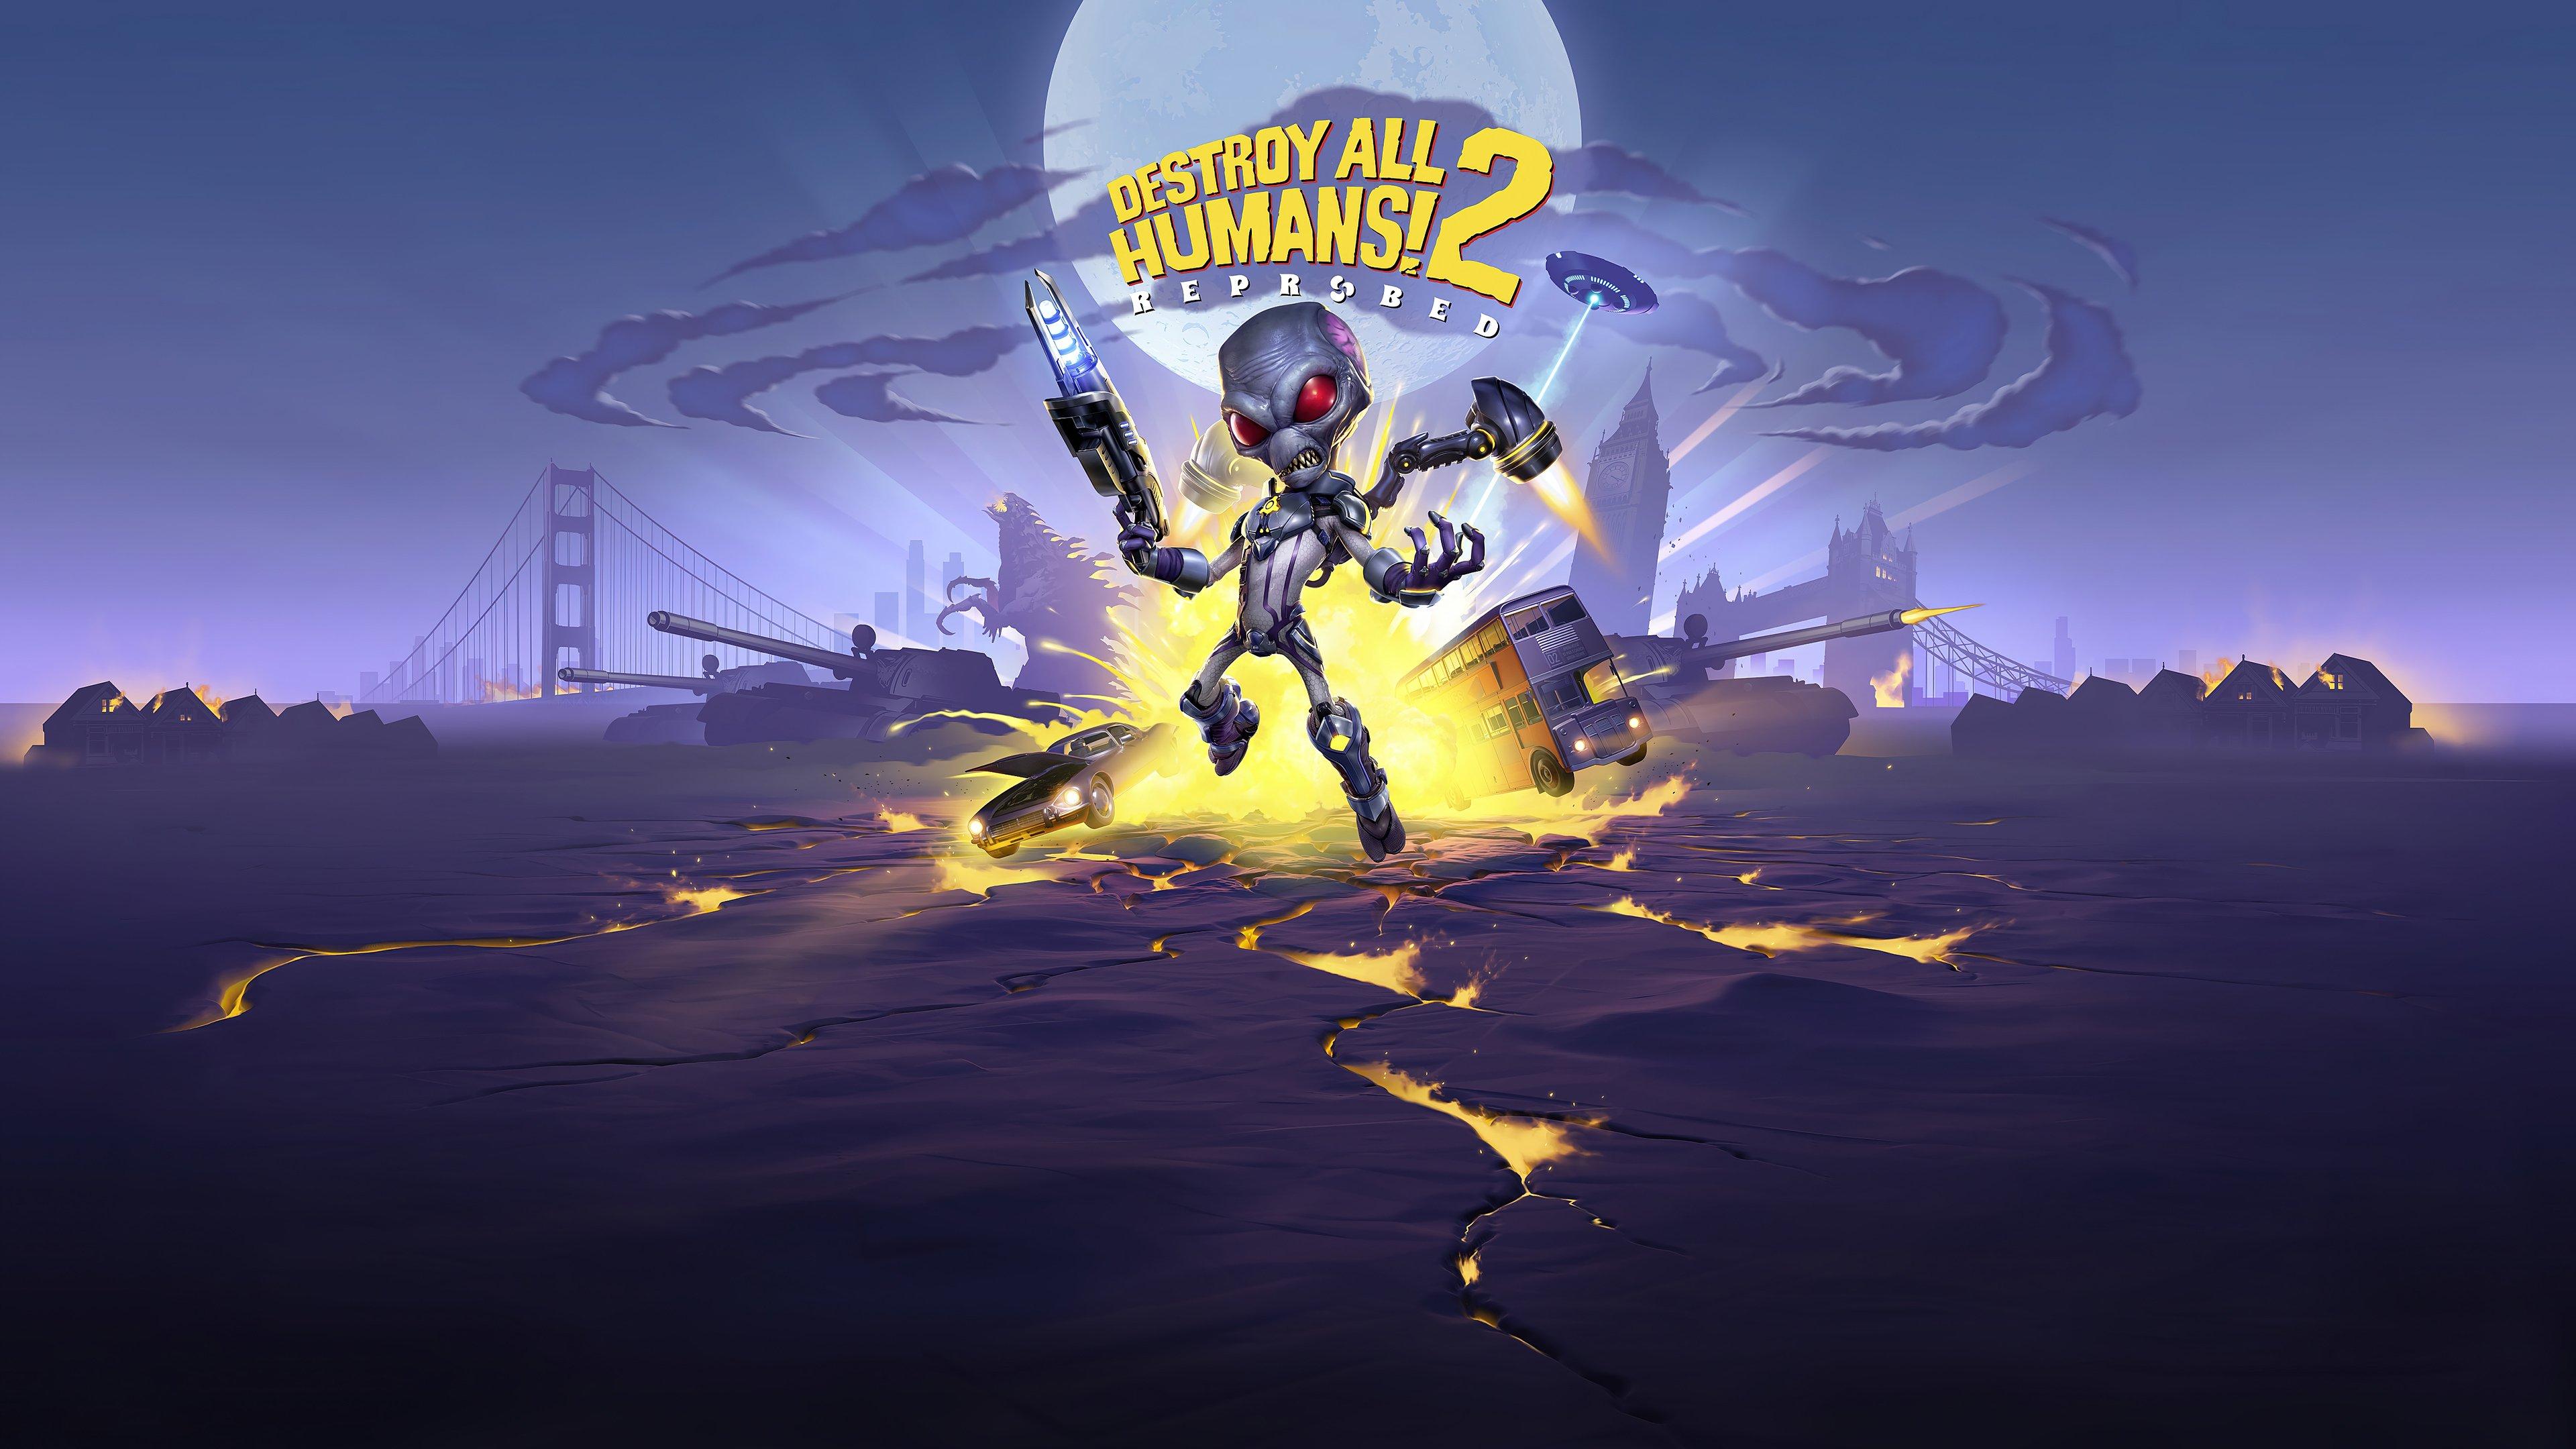 Fondos de pantalla Destroy All Humans! 2